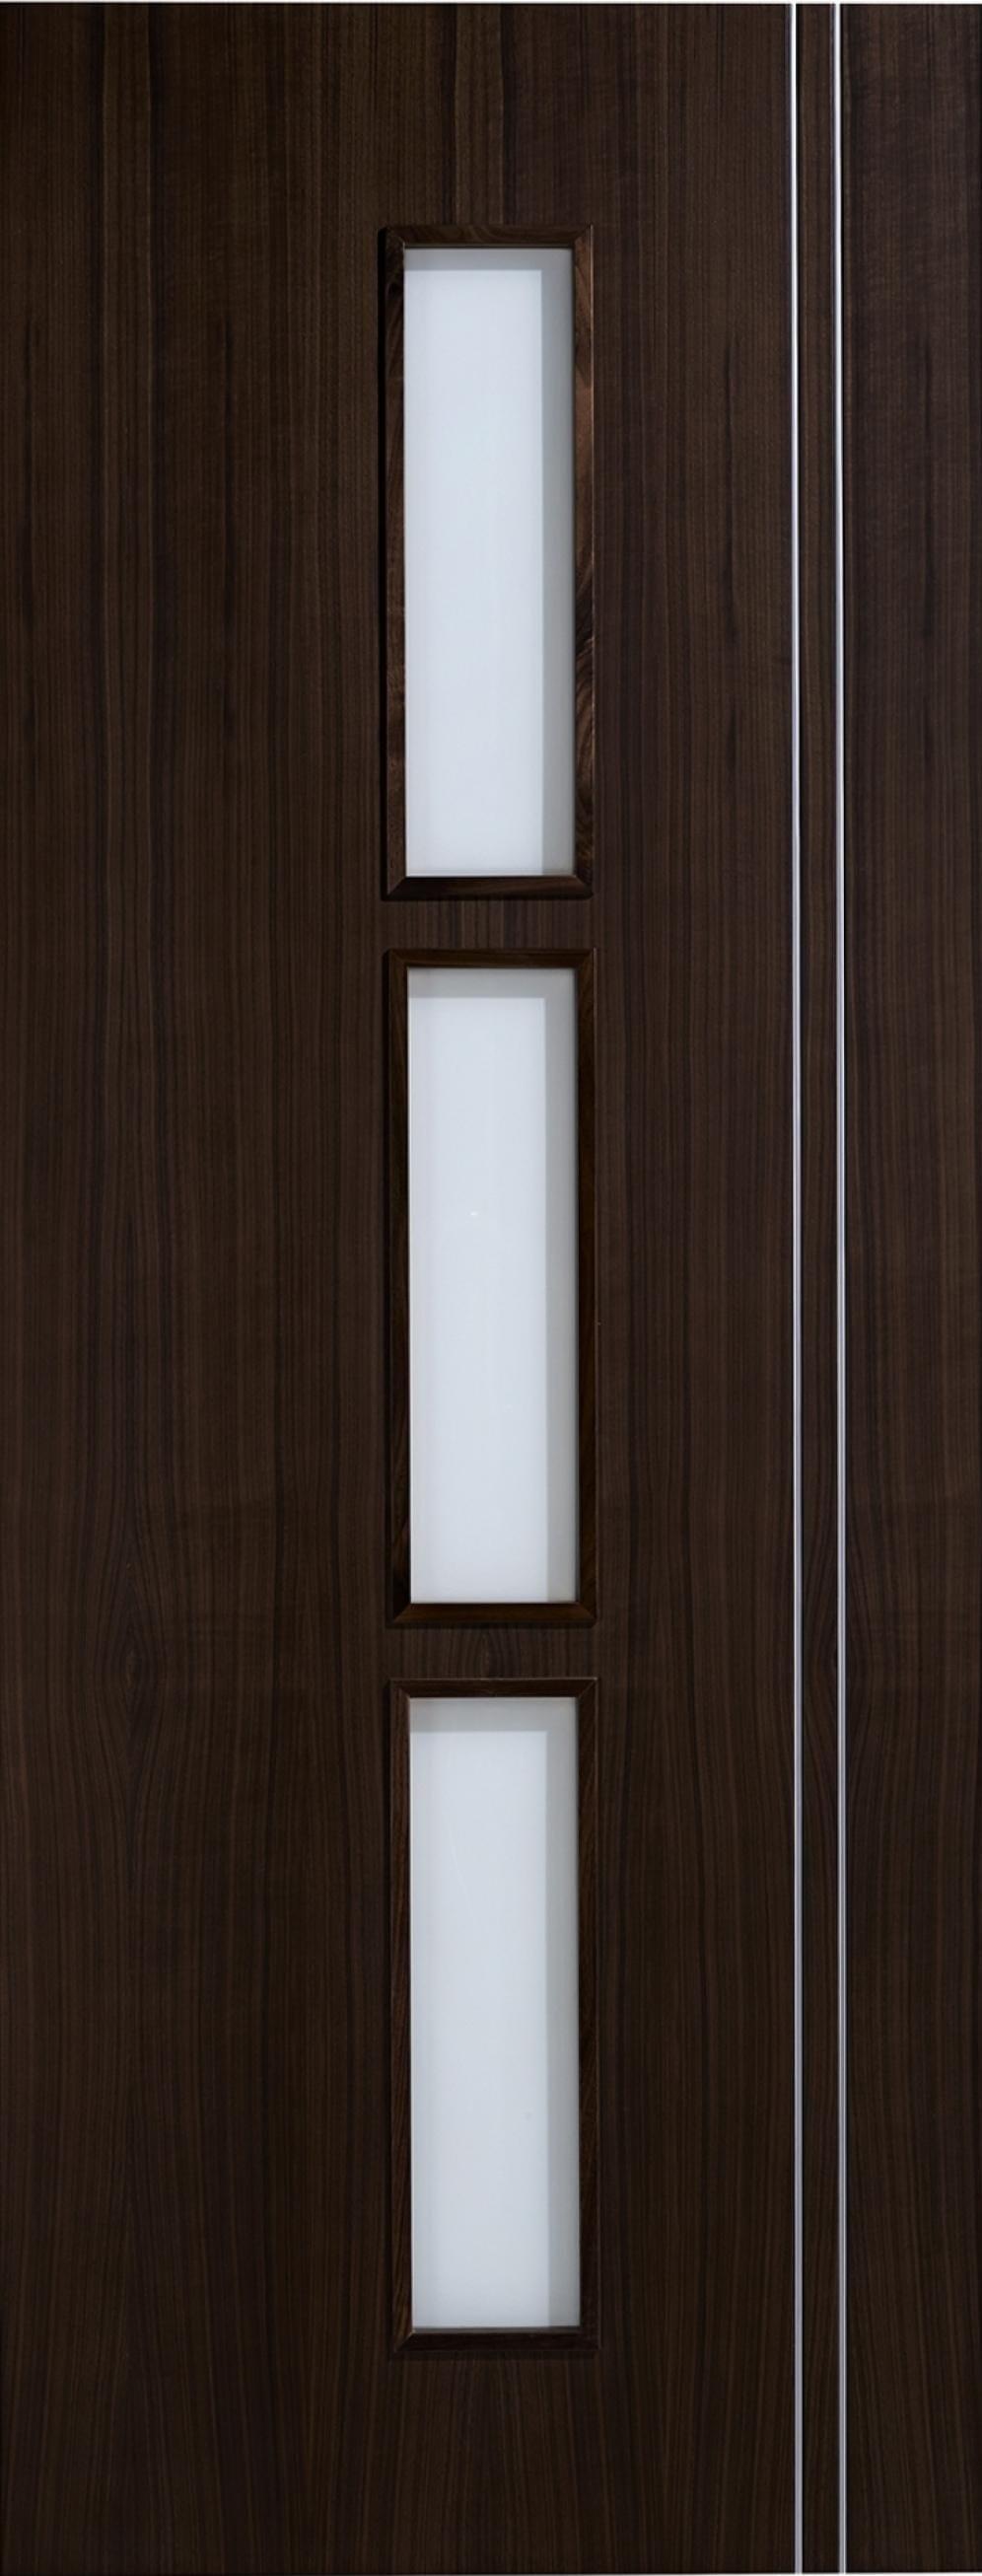 Sierra Walnut Glazed Door Image